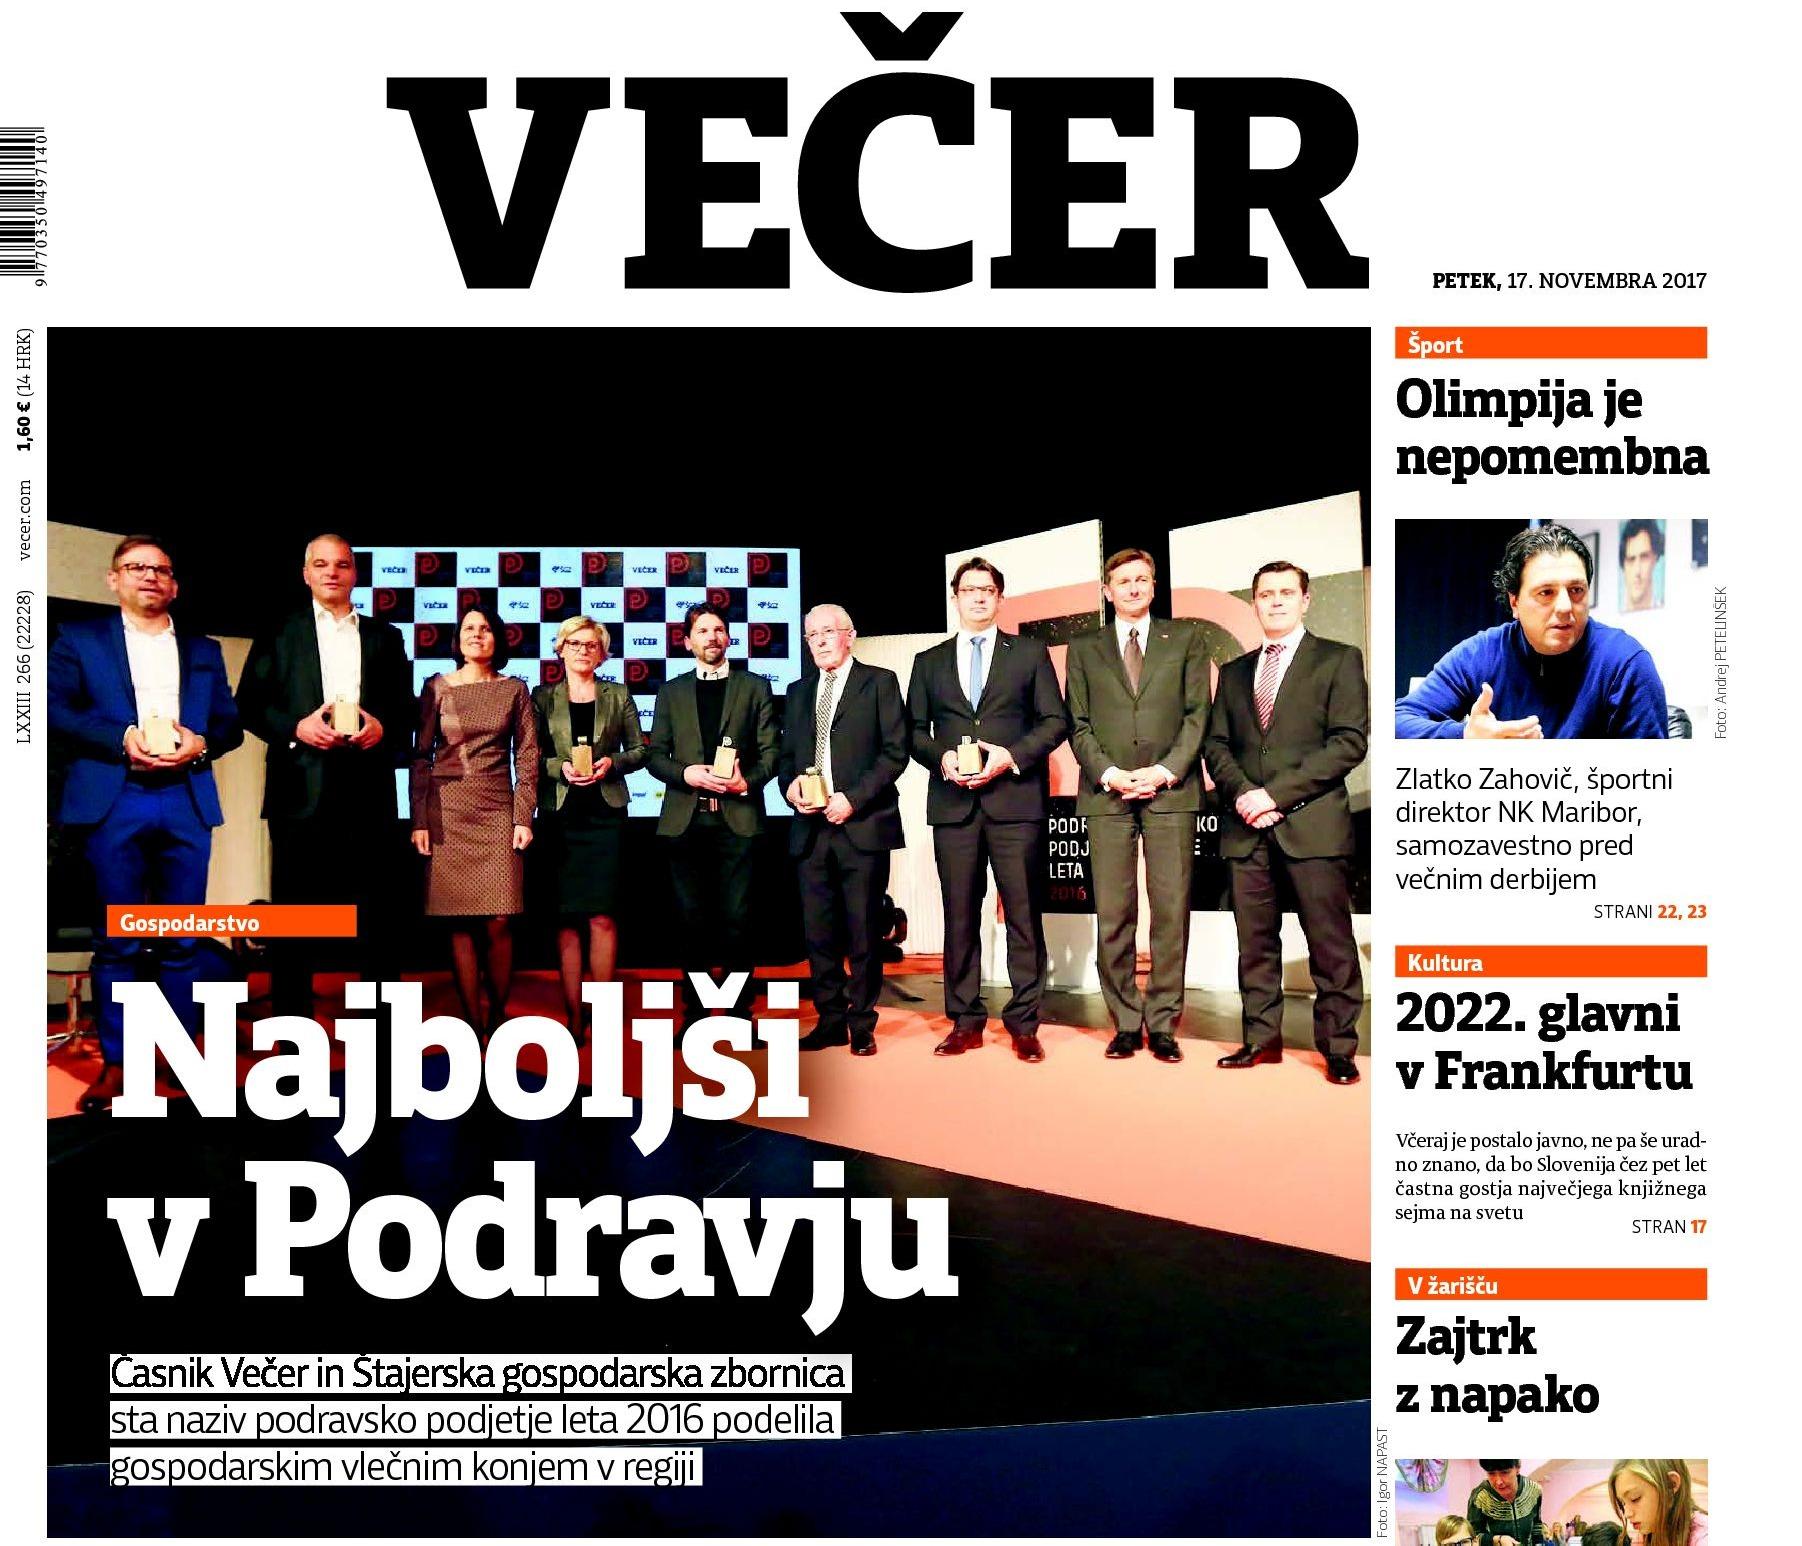 http://shramba.lovrenc.net/anzej/klepet/vecer-2017-11-17.jpg